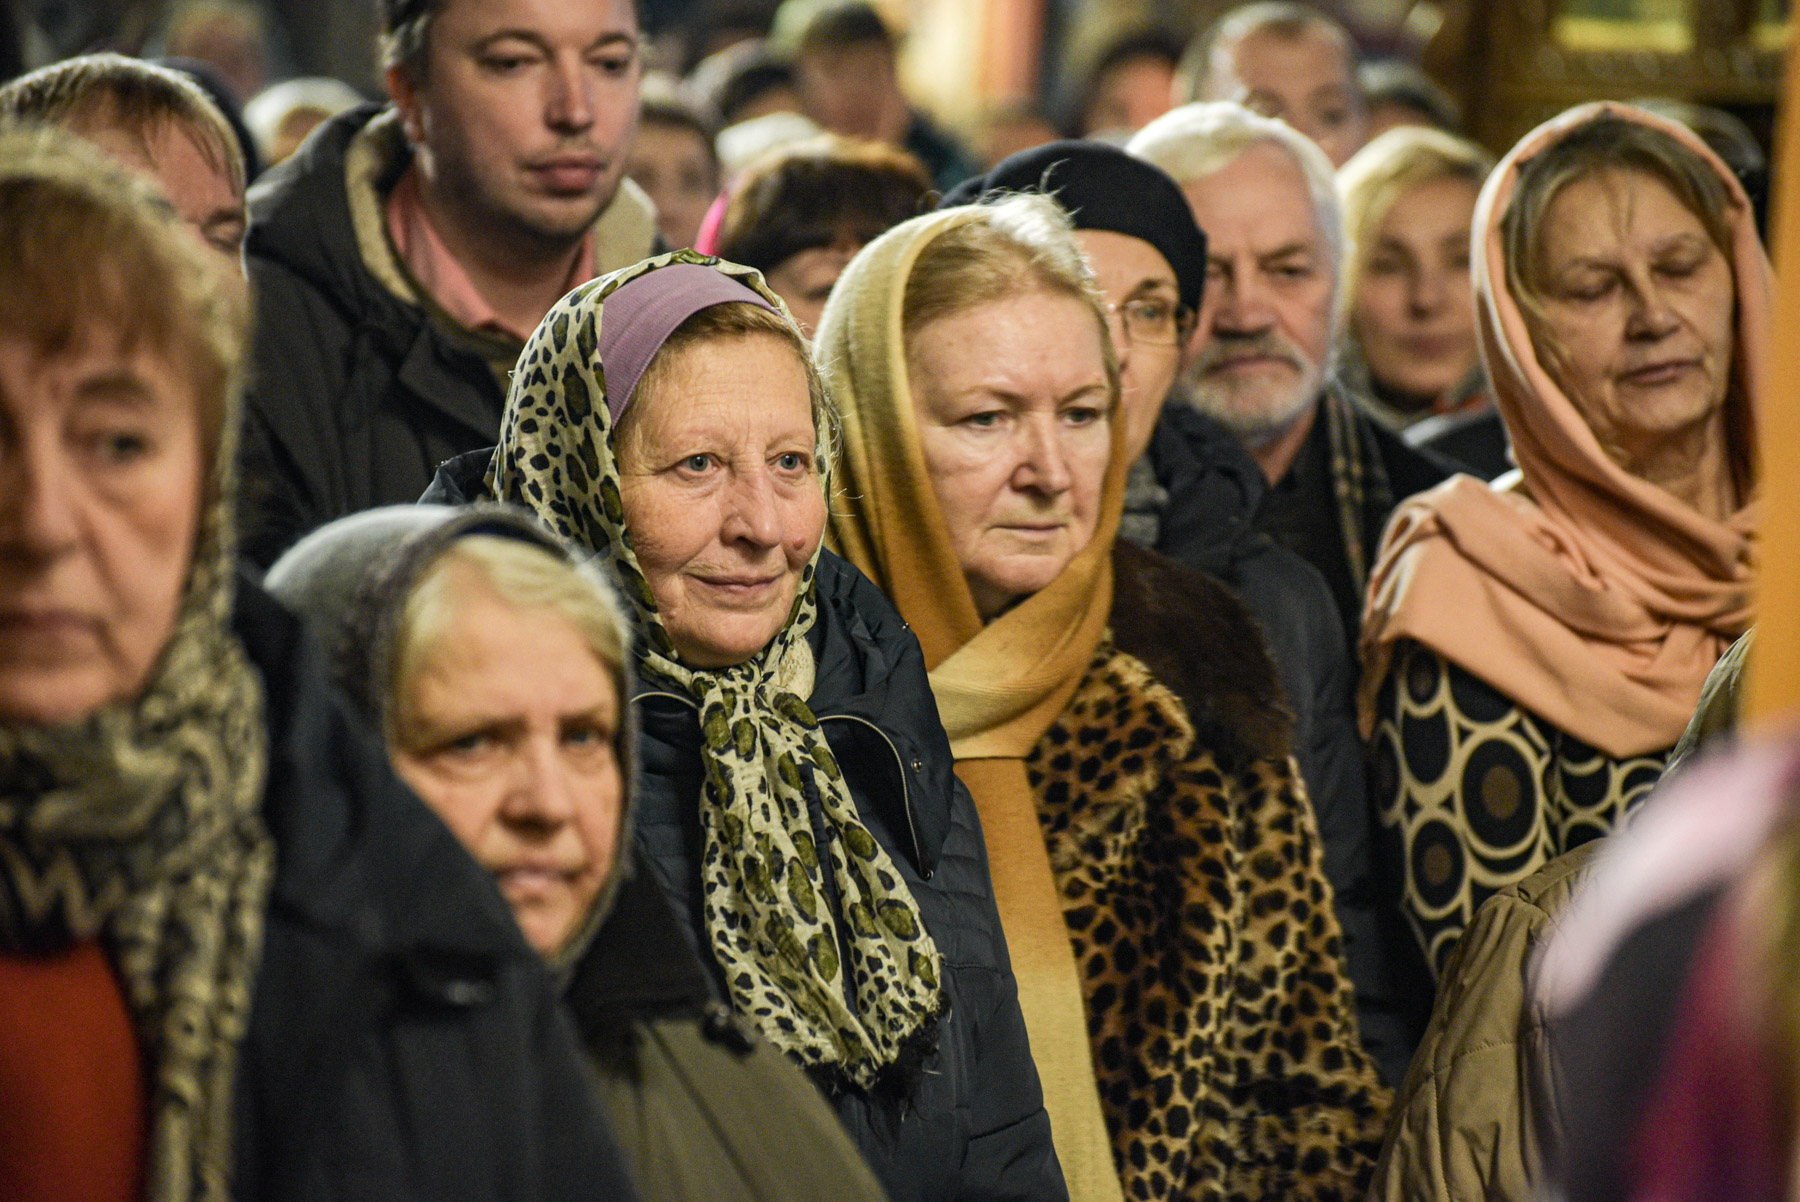 photos of orthodox christmas 0254 1